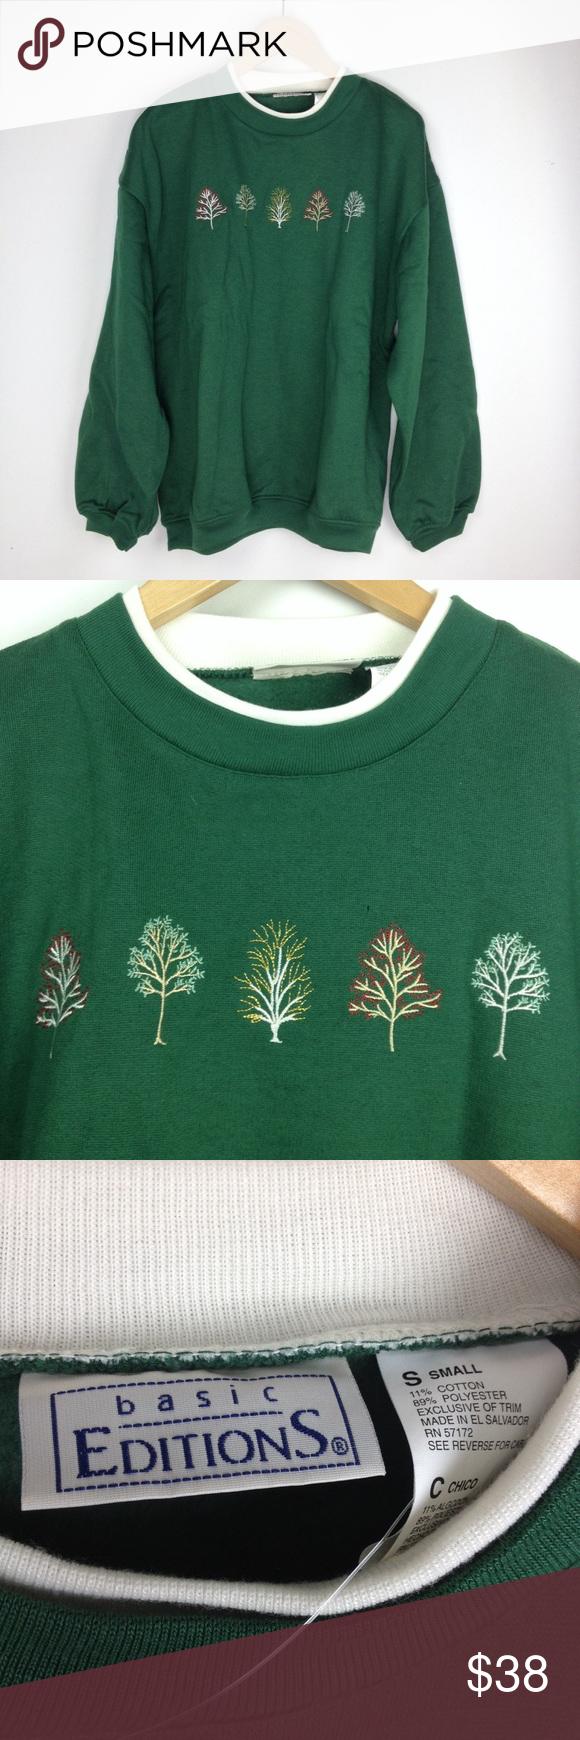 a0f8f1088c Basic editions green christmas sweatshirt sweater | My Posh Closet |  Pinterest | Sweaters, Sweatshirts and Closet